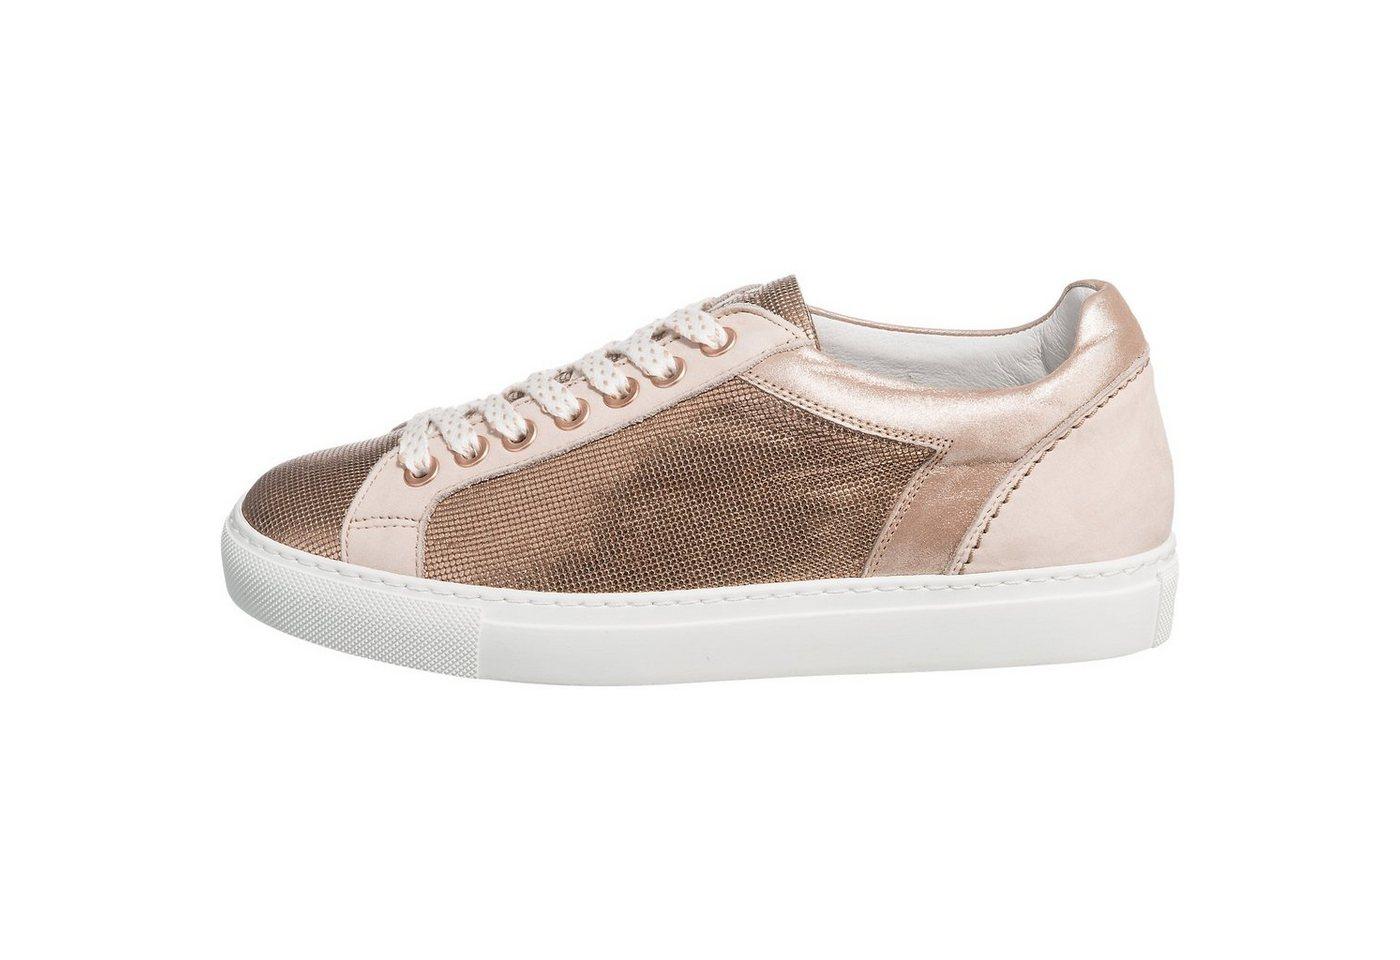 VIA VAI Uma Sneakers